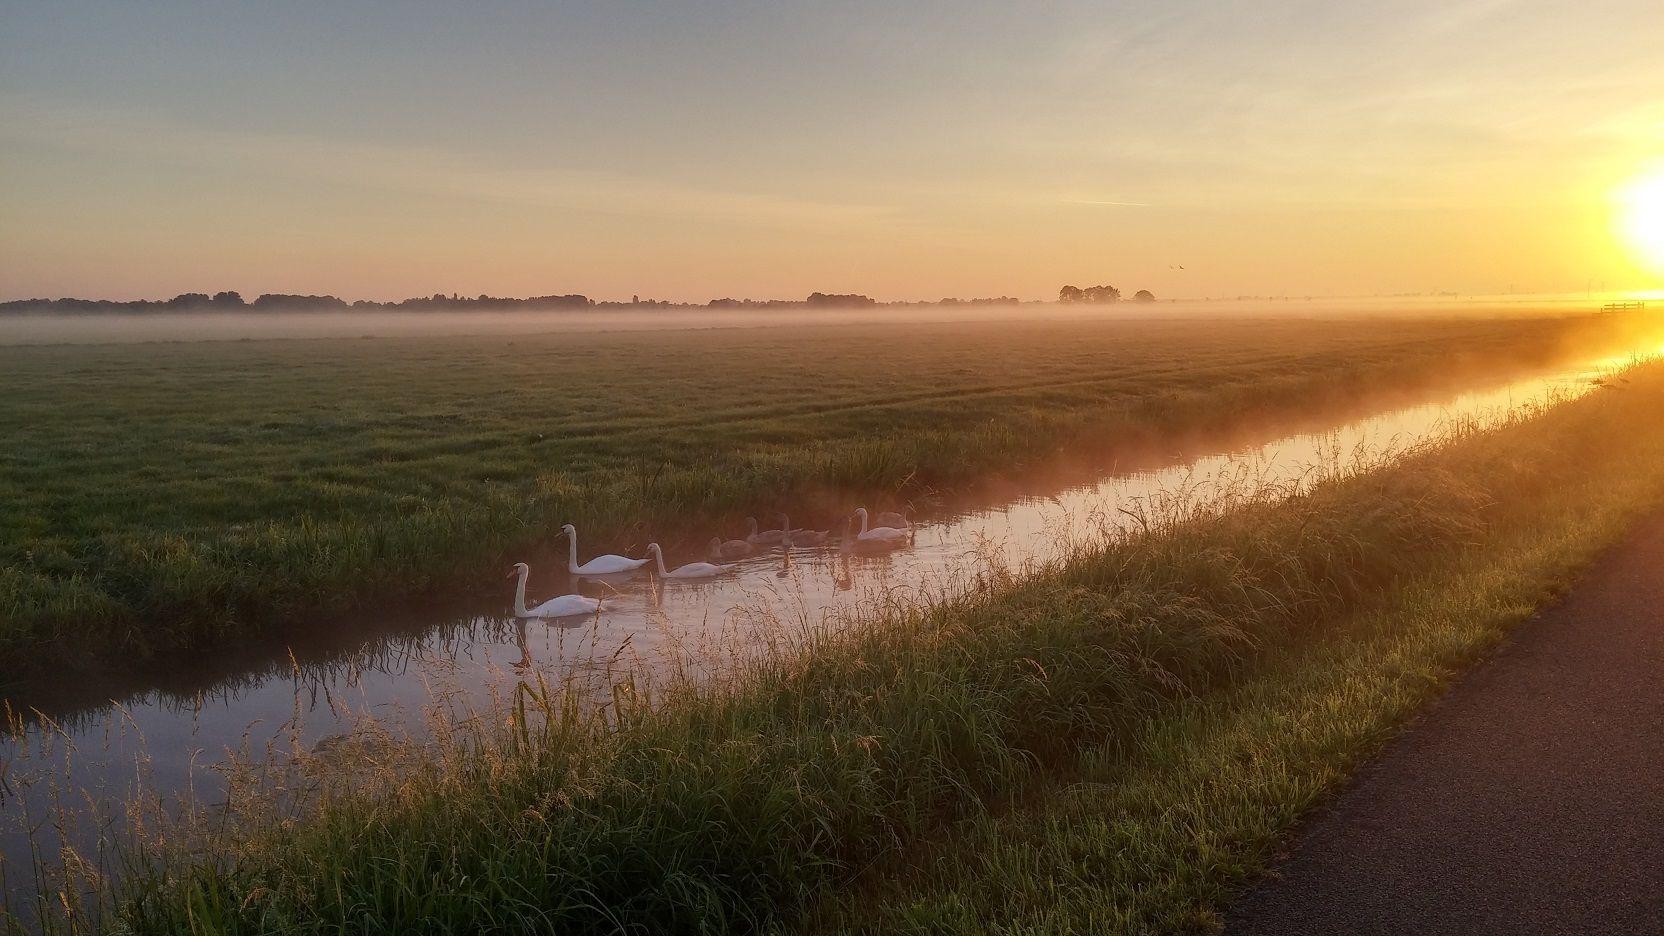 Near Kockengen, The Netherlands (2015)